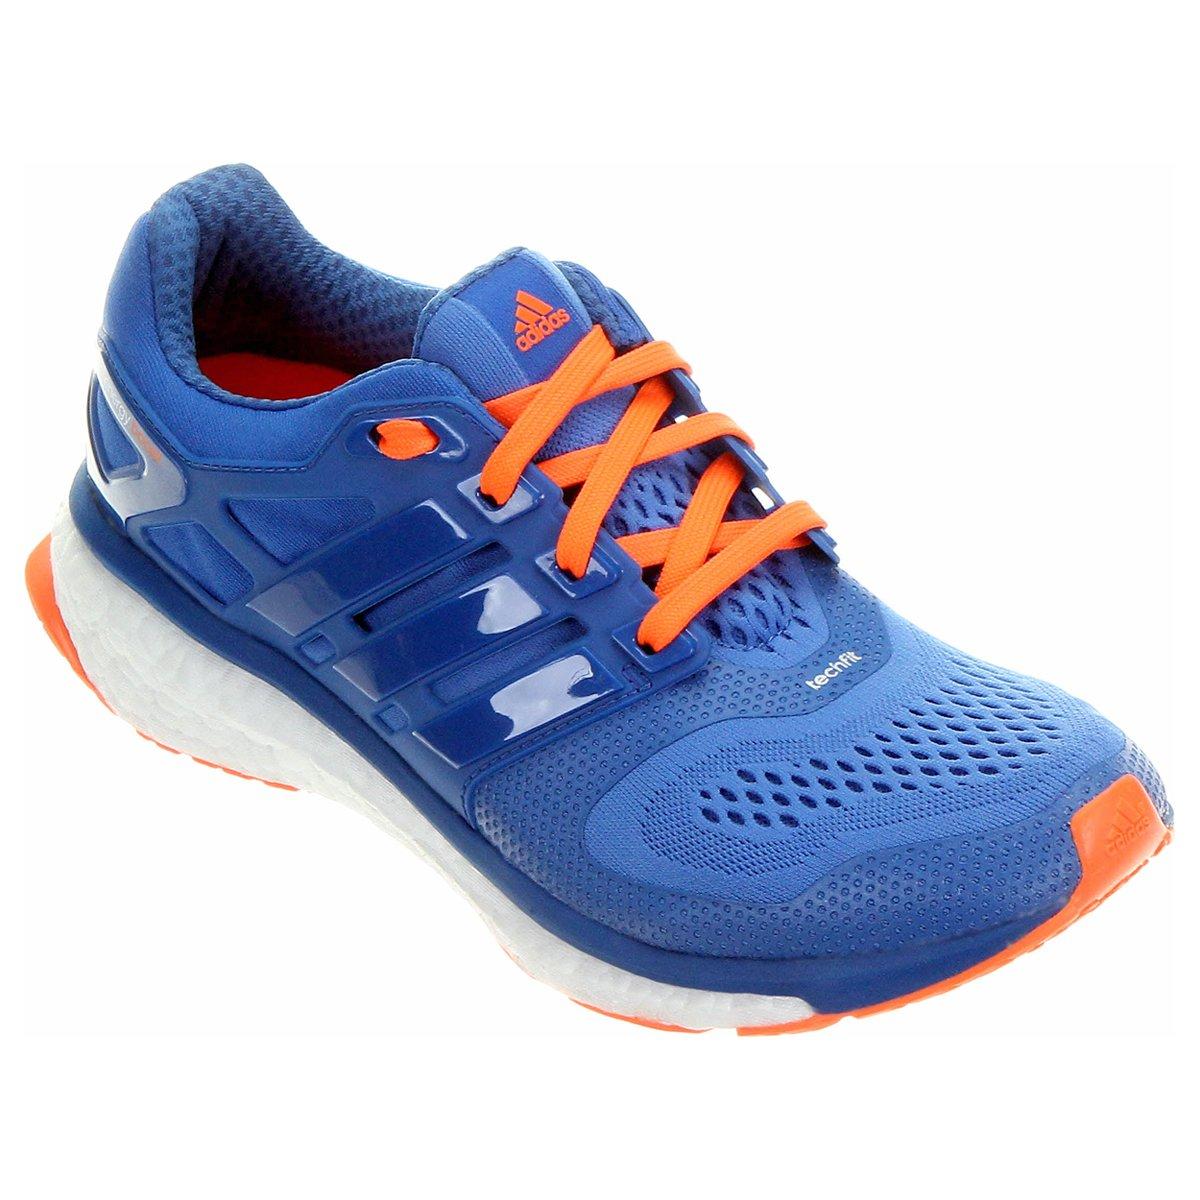 30562175b21c6 Tênis Adidas Energy Boost ESM Masculino - Compre Agora